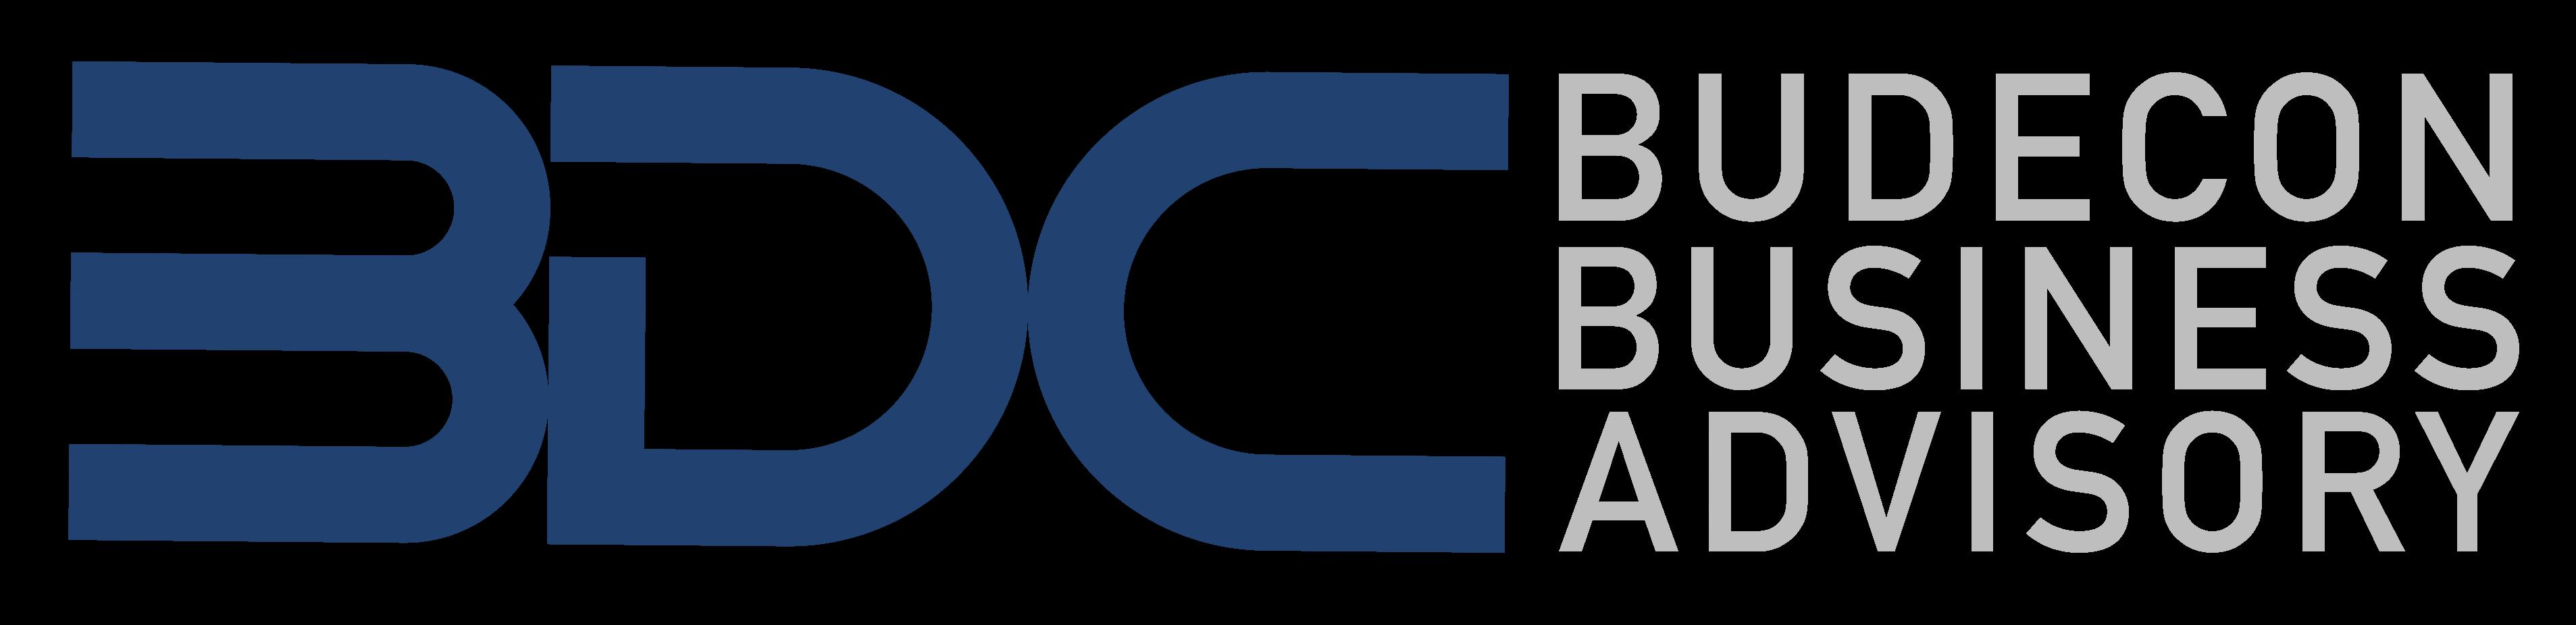 Budecon – Business Advisory